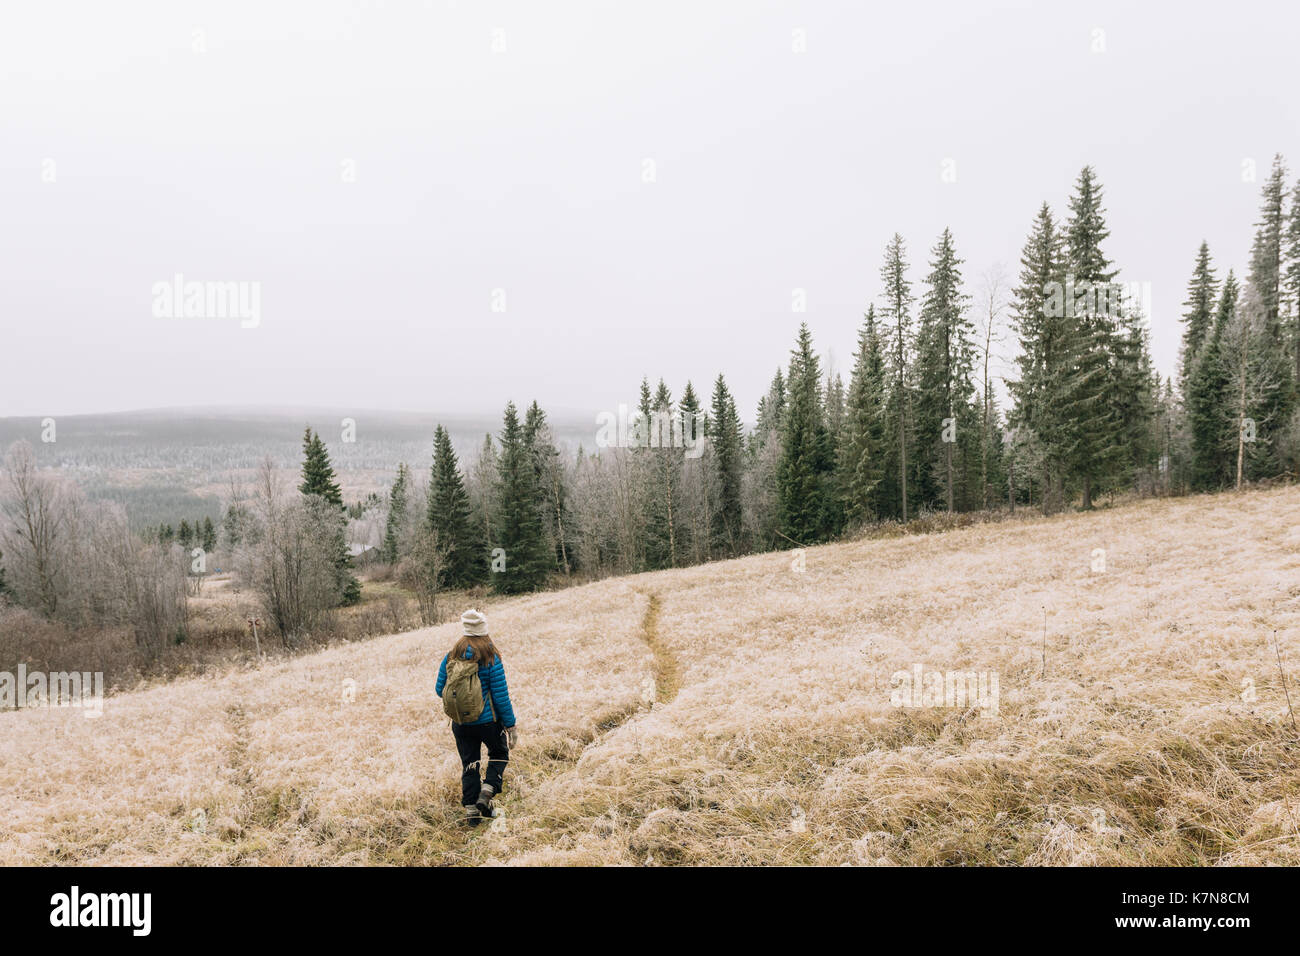 Junge Frau wandern auf dem Weg durch offene Feld im frostigen Landschaft Stockbild